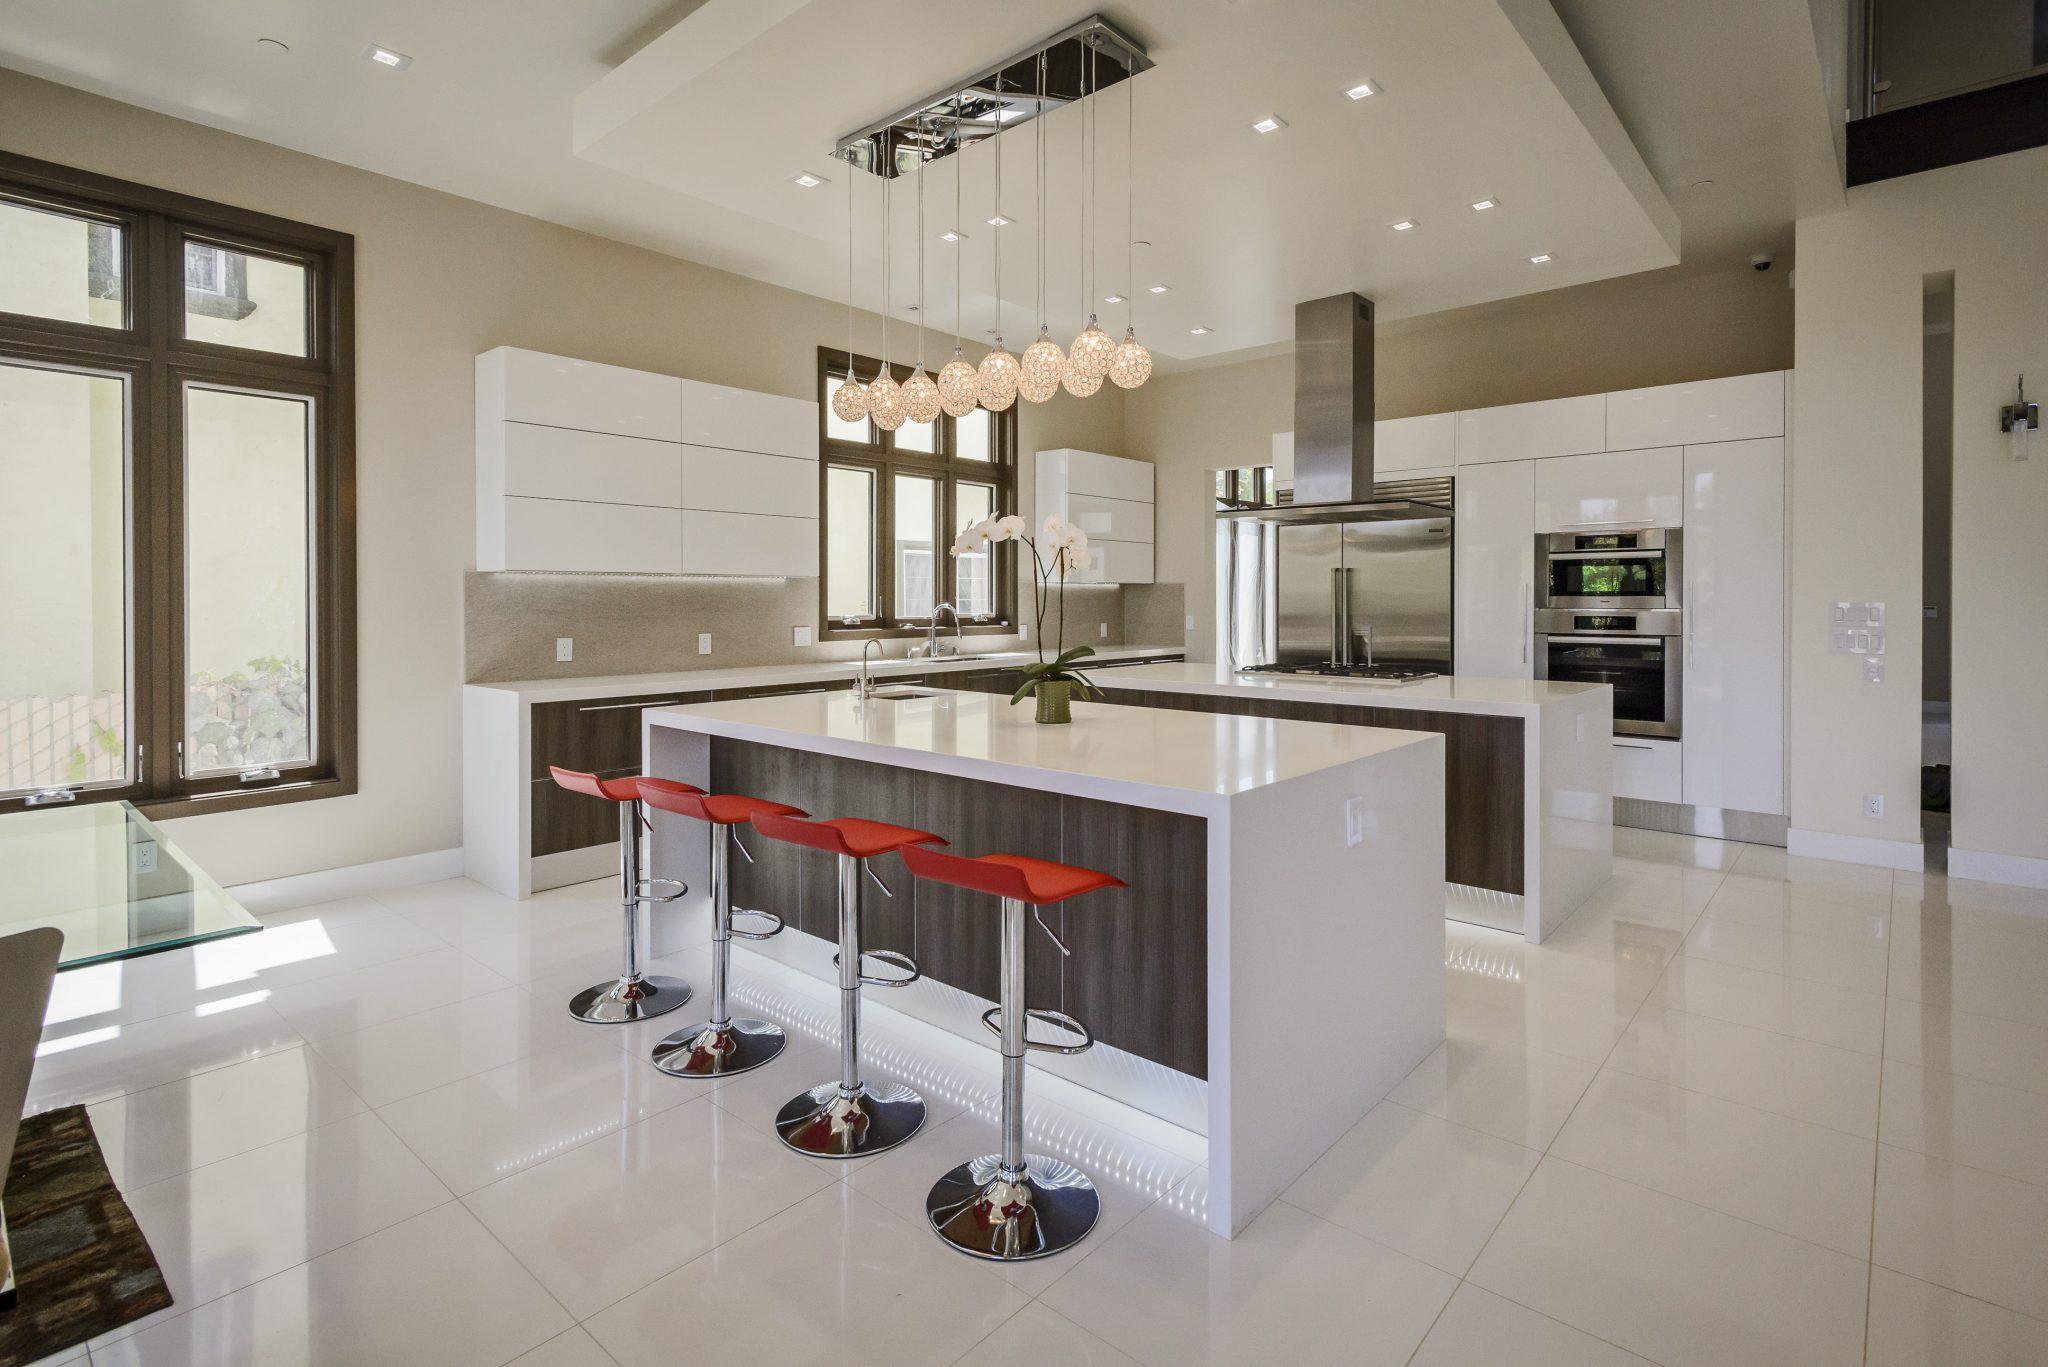 Kitchen cabinets northvale nj - Kitchen Cabinets Northvale Nj 56